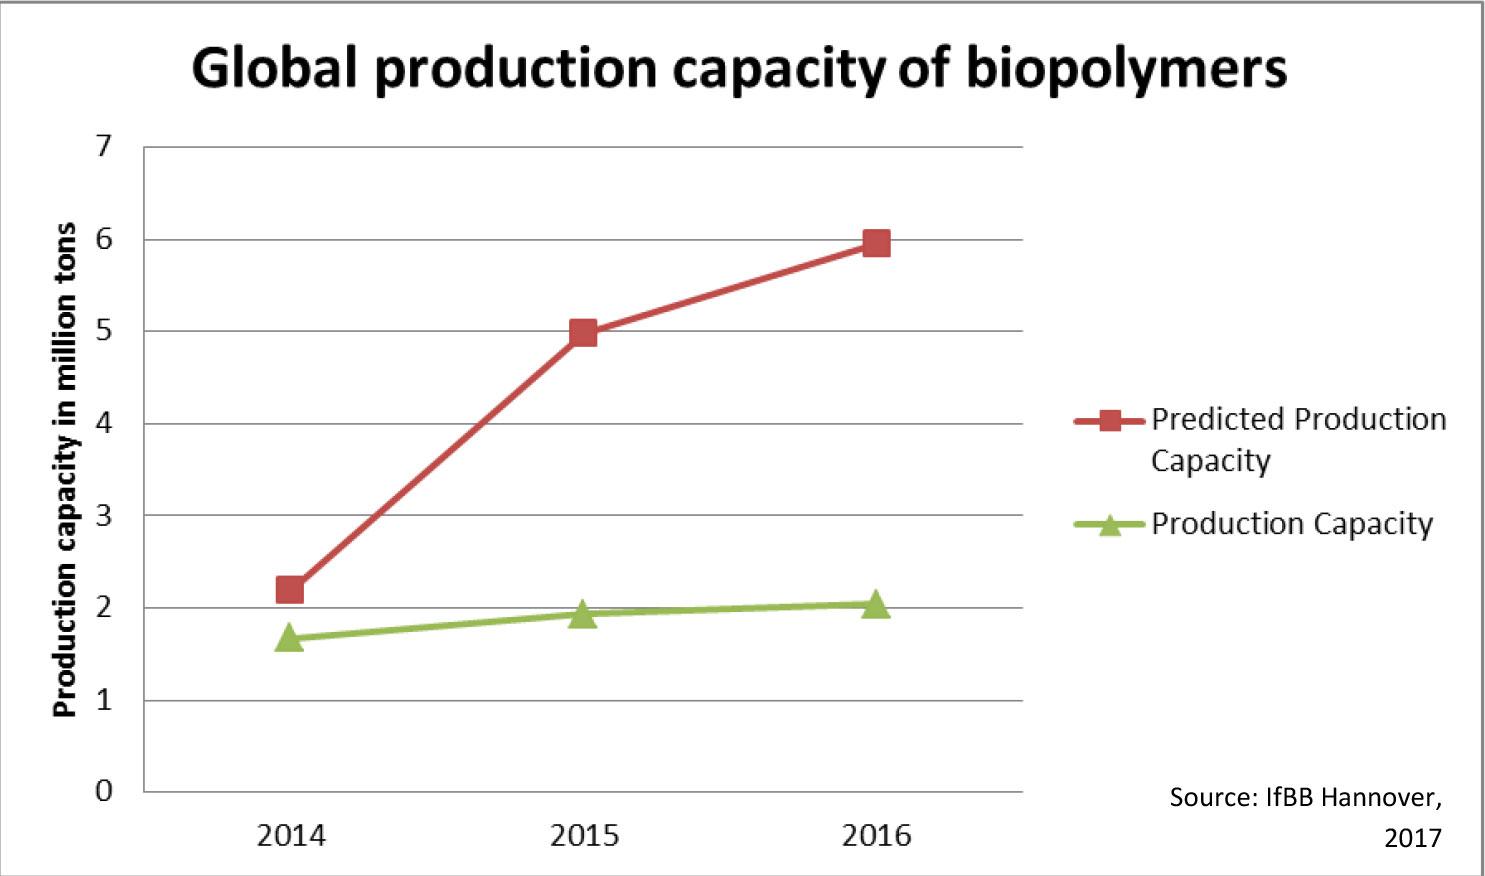 Cross-border cooperation in biobased materials